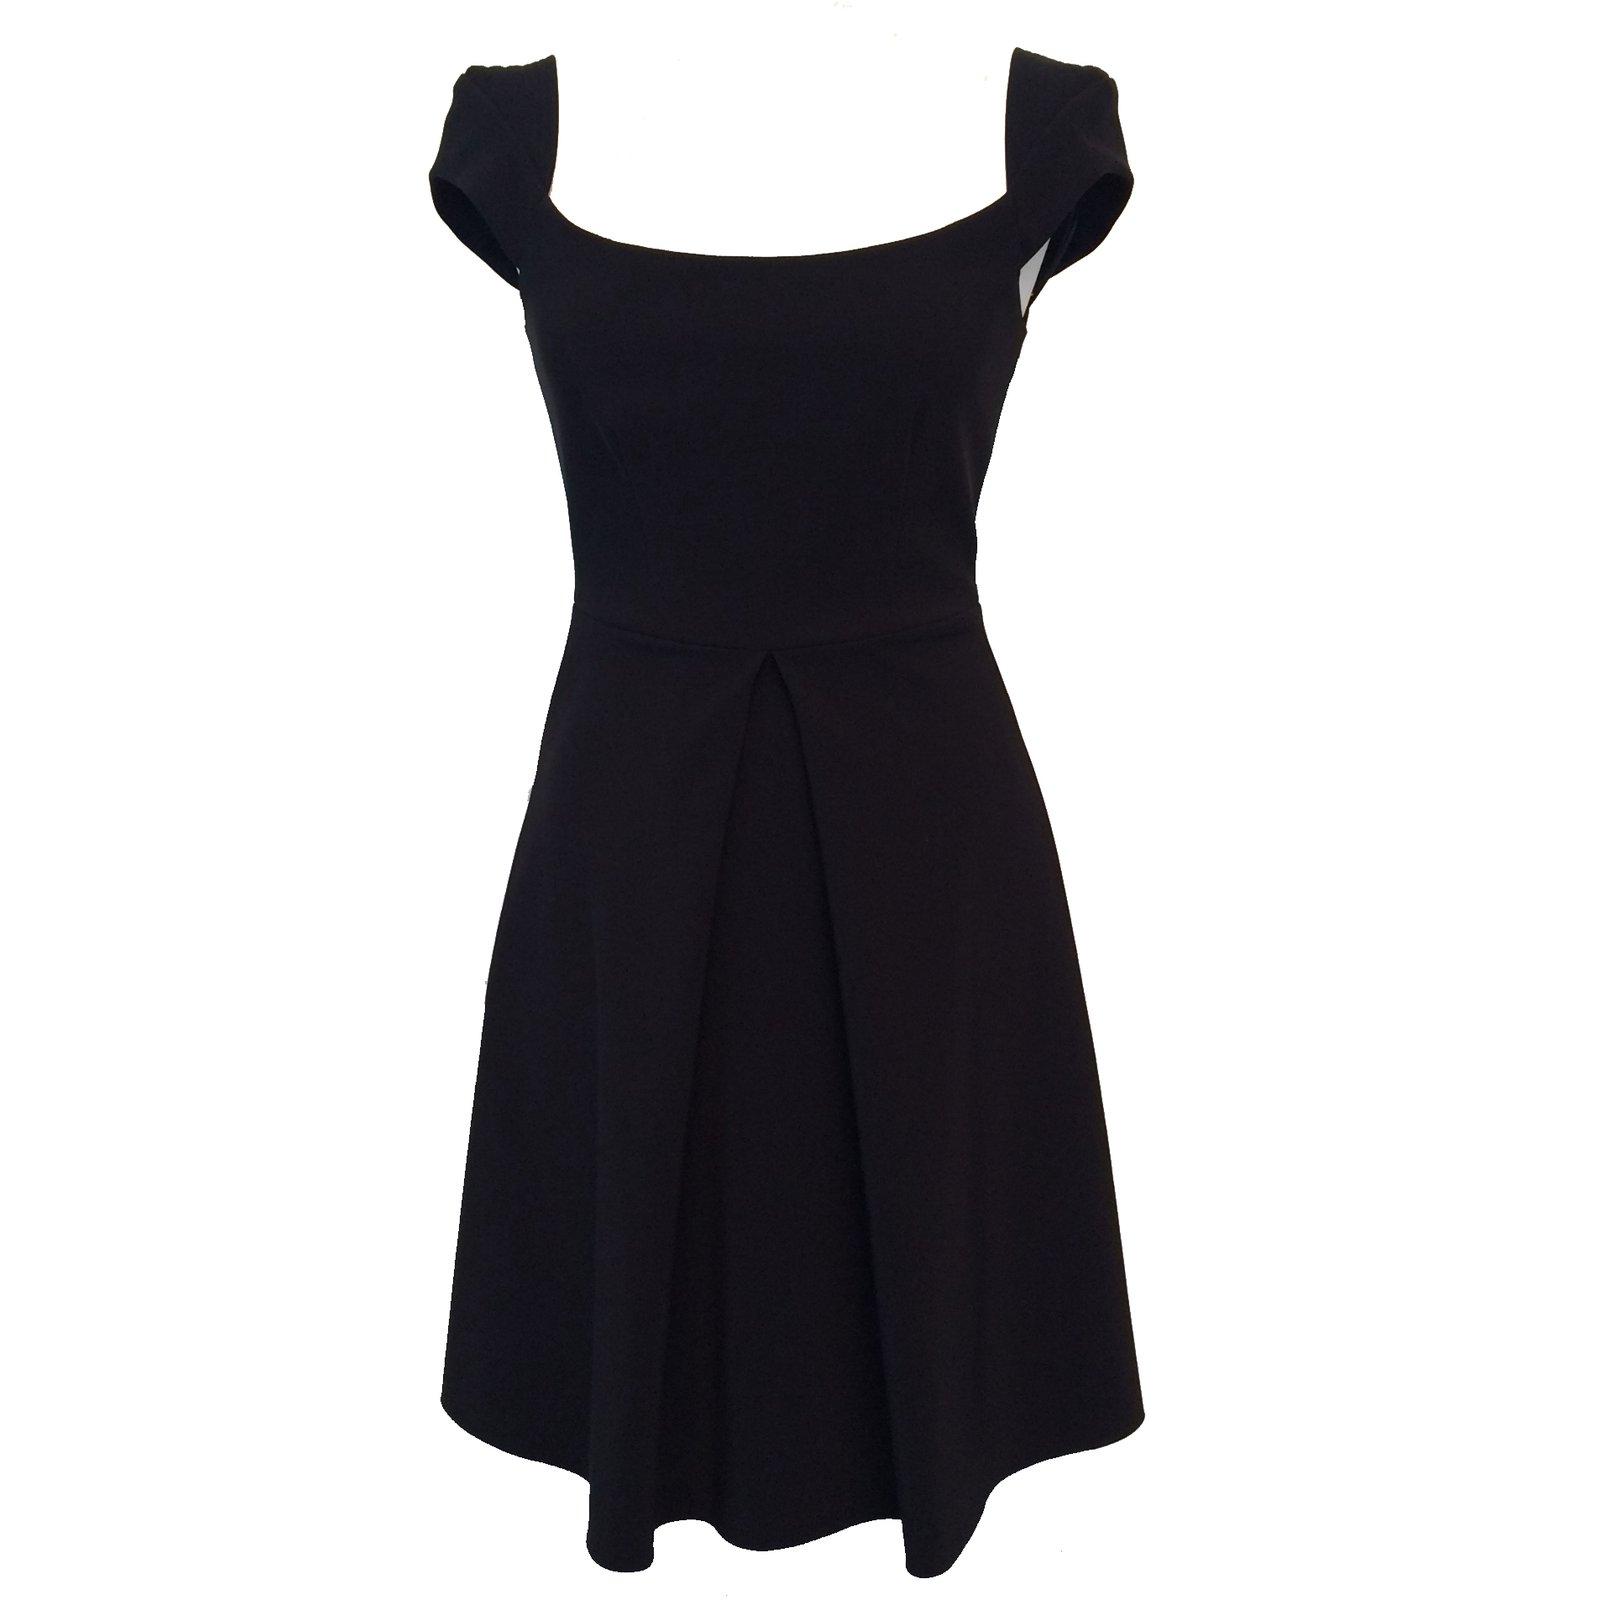 Robes Pinko Petite Robe Noire Autre Noir Ref 20639 Joli Closet